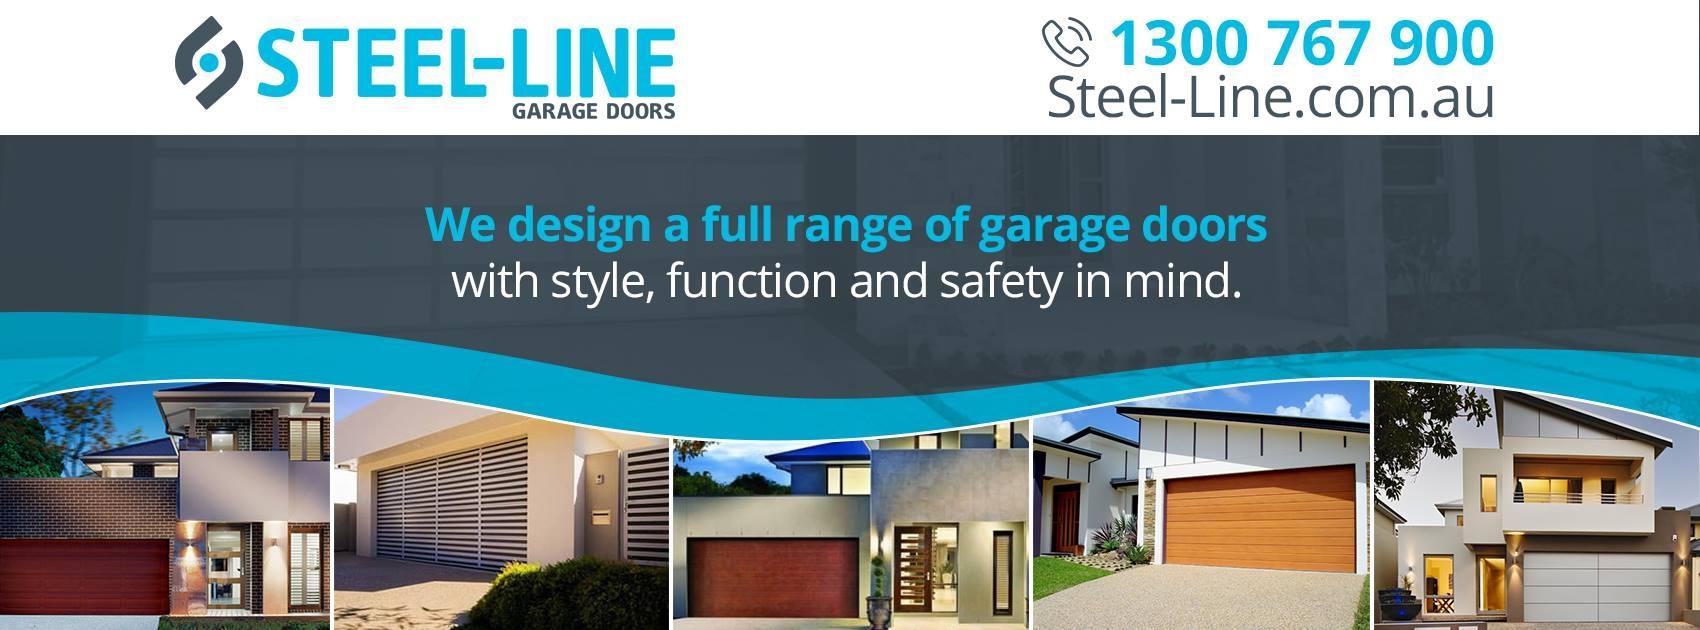 Garage Doors Brisbane (@garagedoorsbrisbane) Cover Image